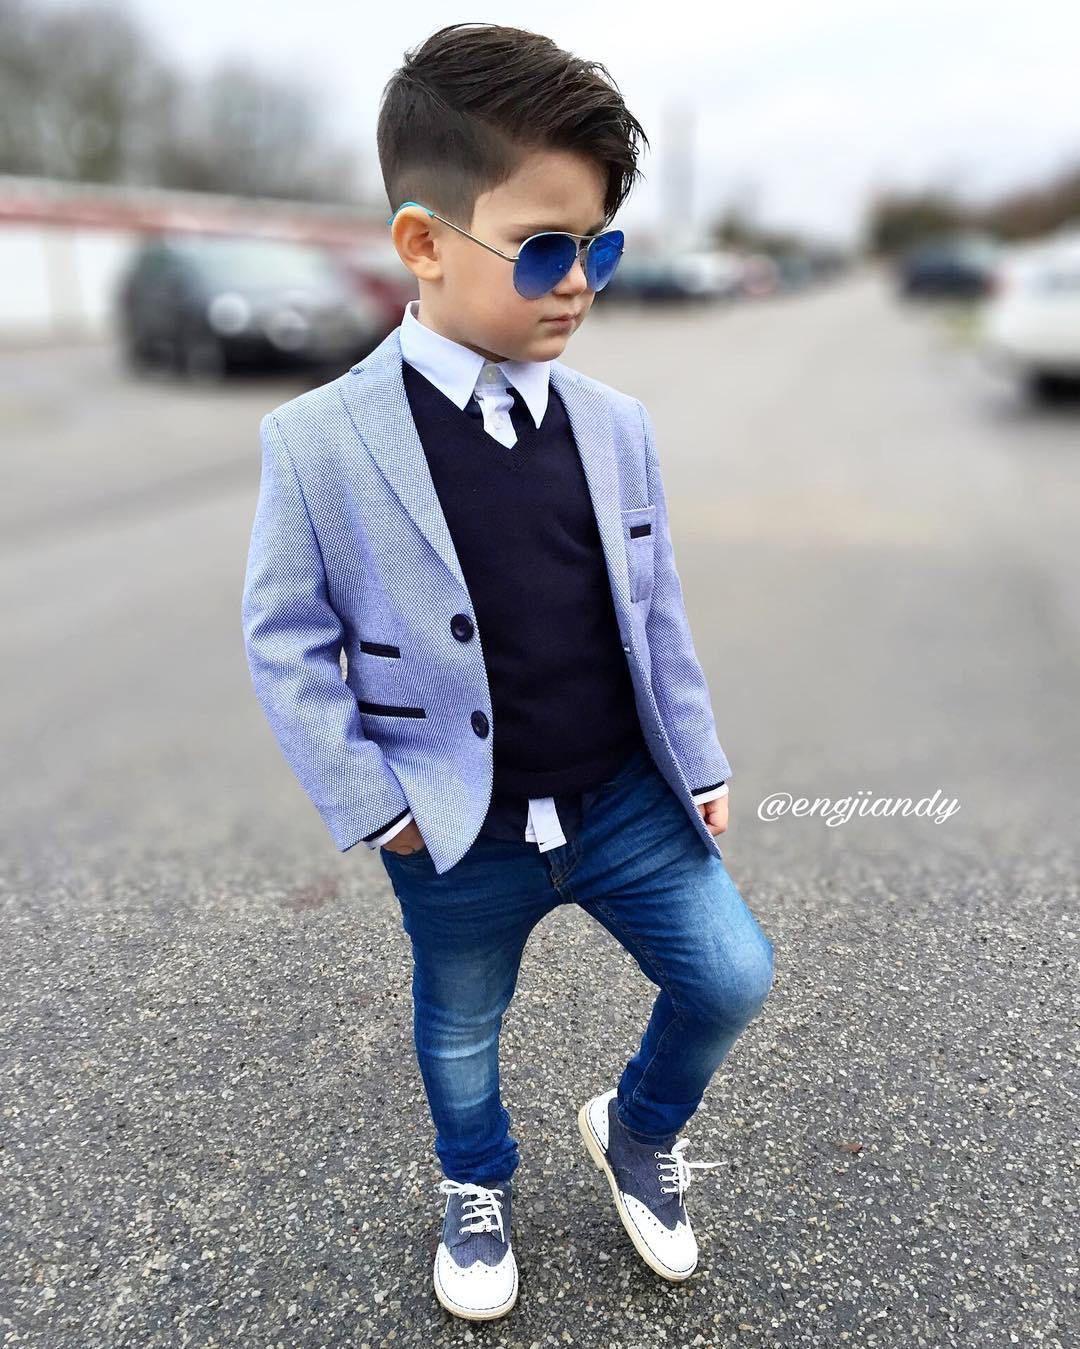 Boy Street Fashion Ropa Para Niños Varones Ropa Elegante